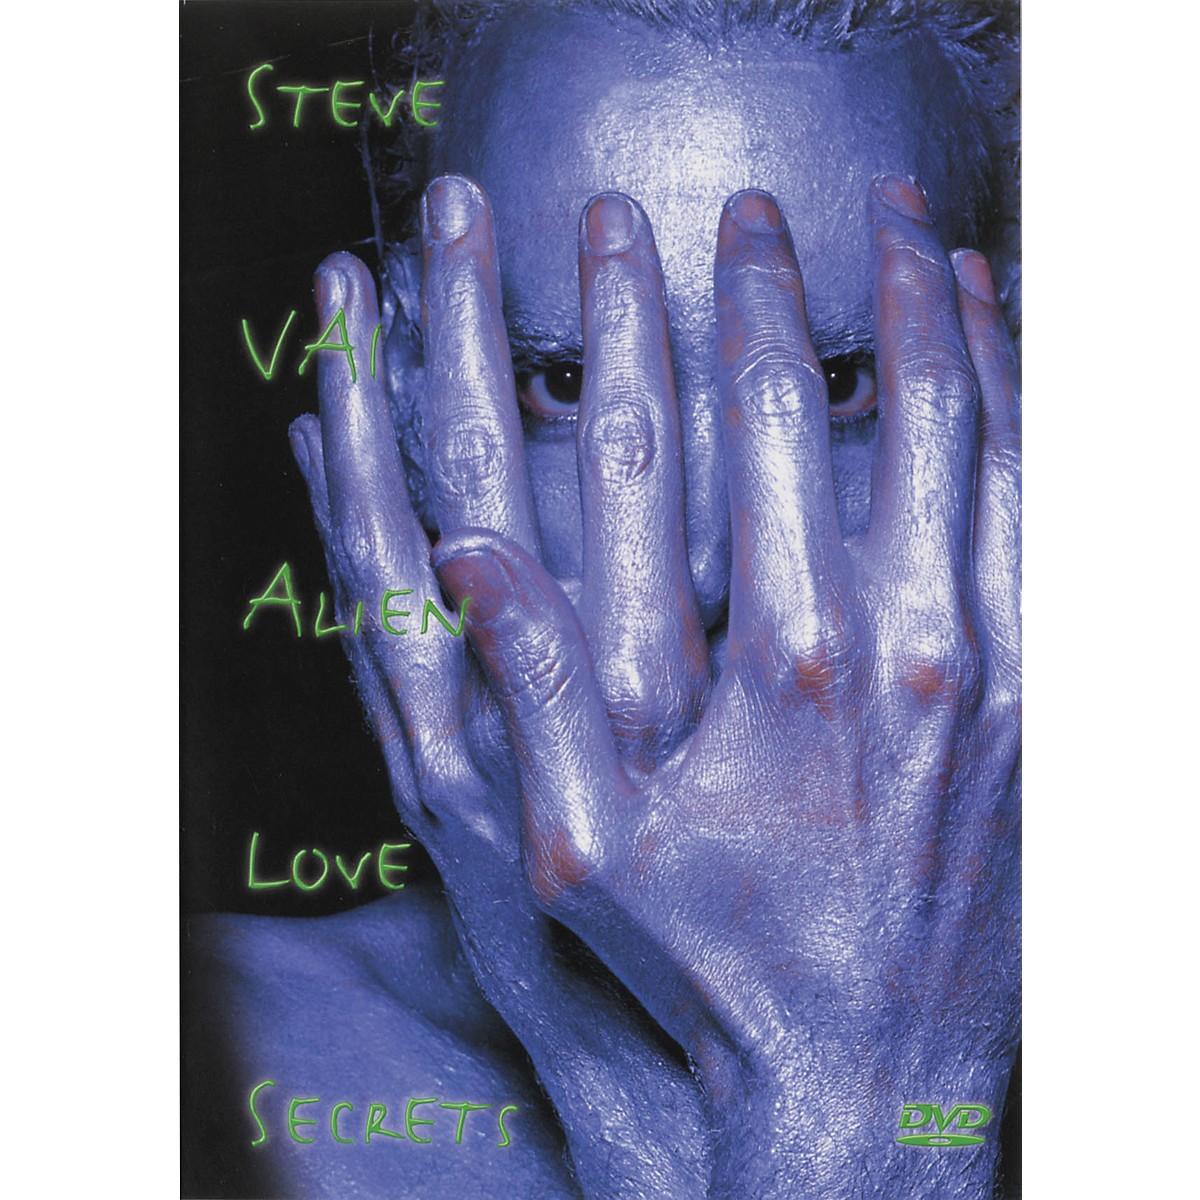 Hal Leonard Steve Vai - Alien Love Secrets DVD